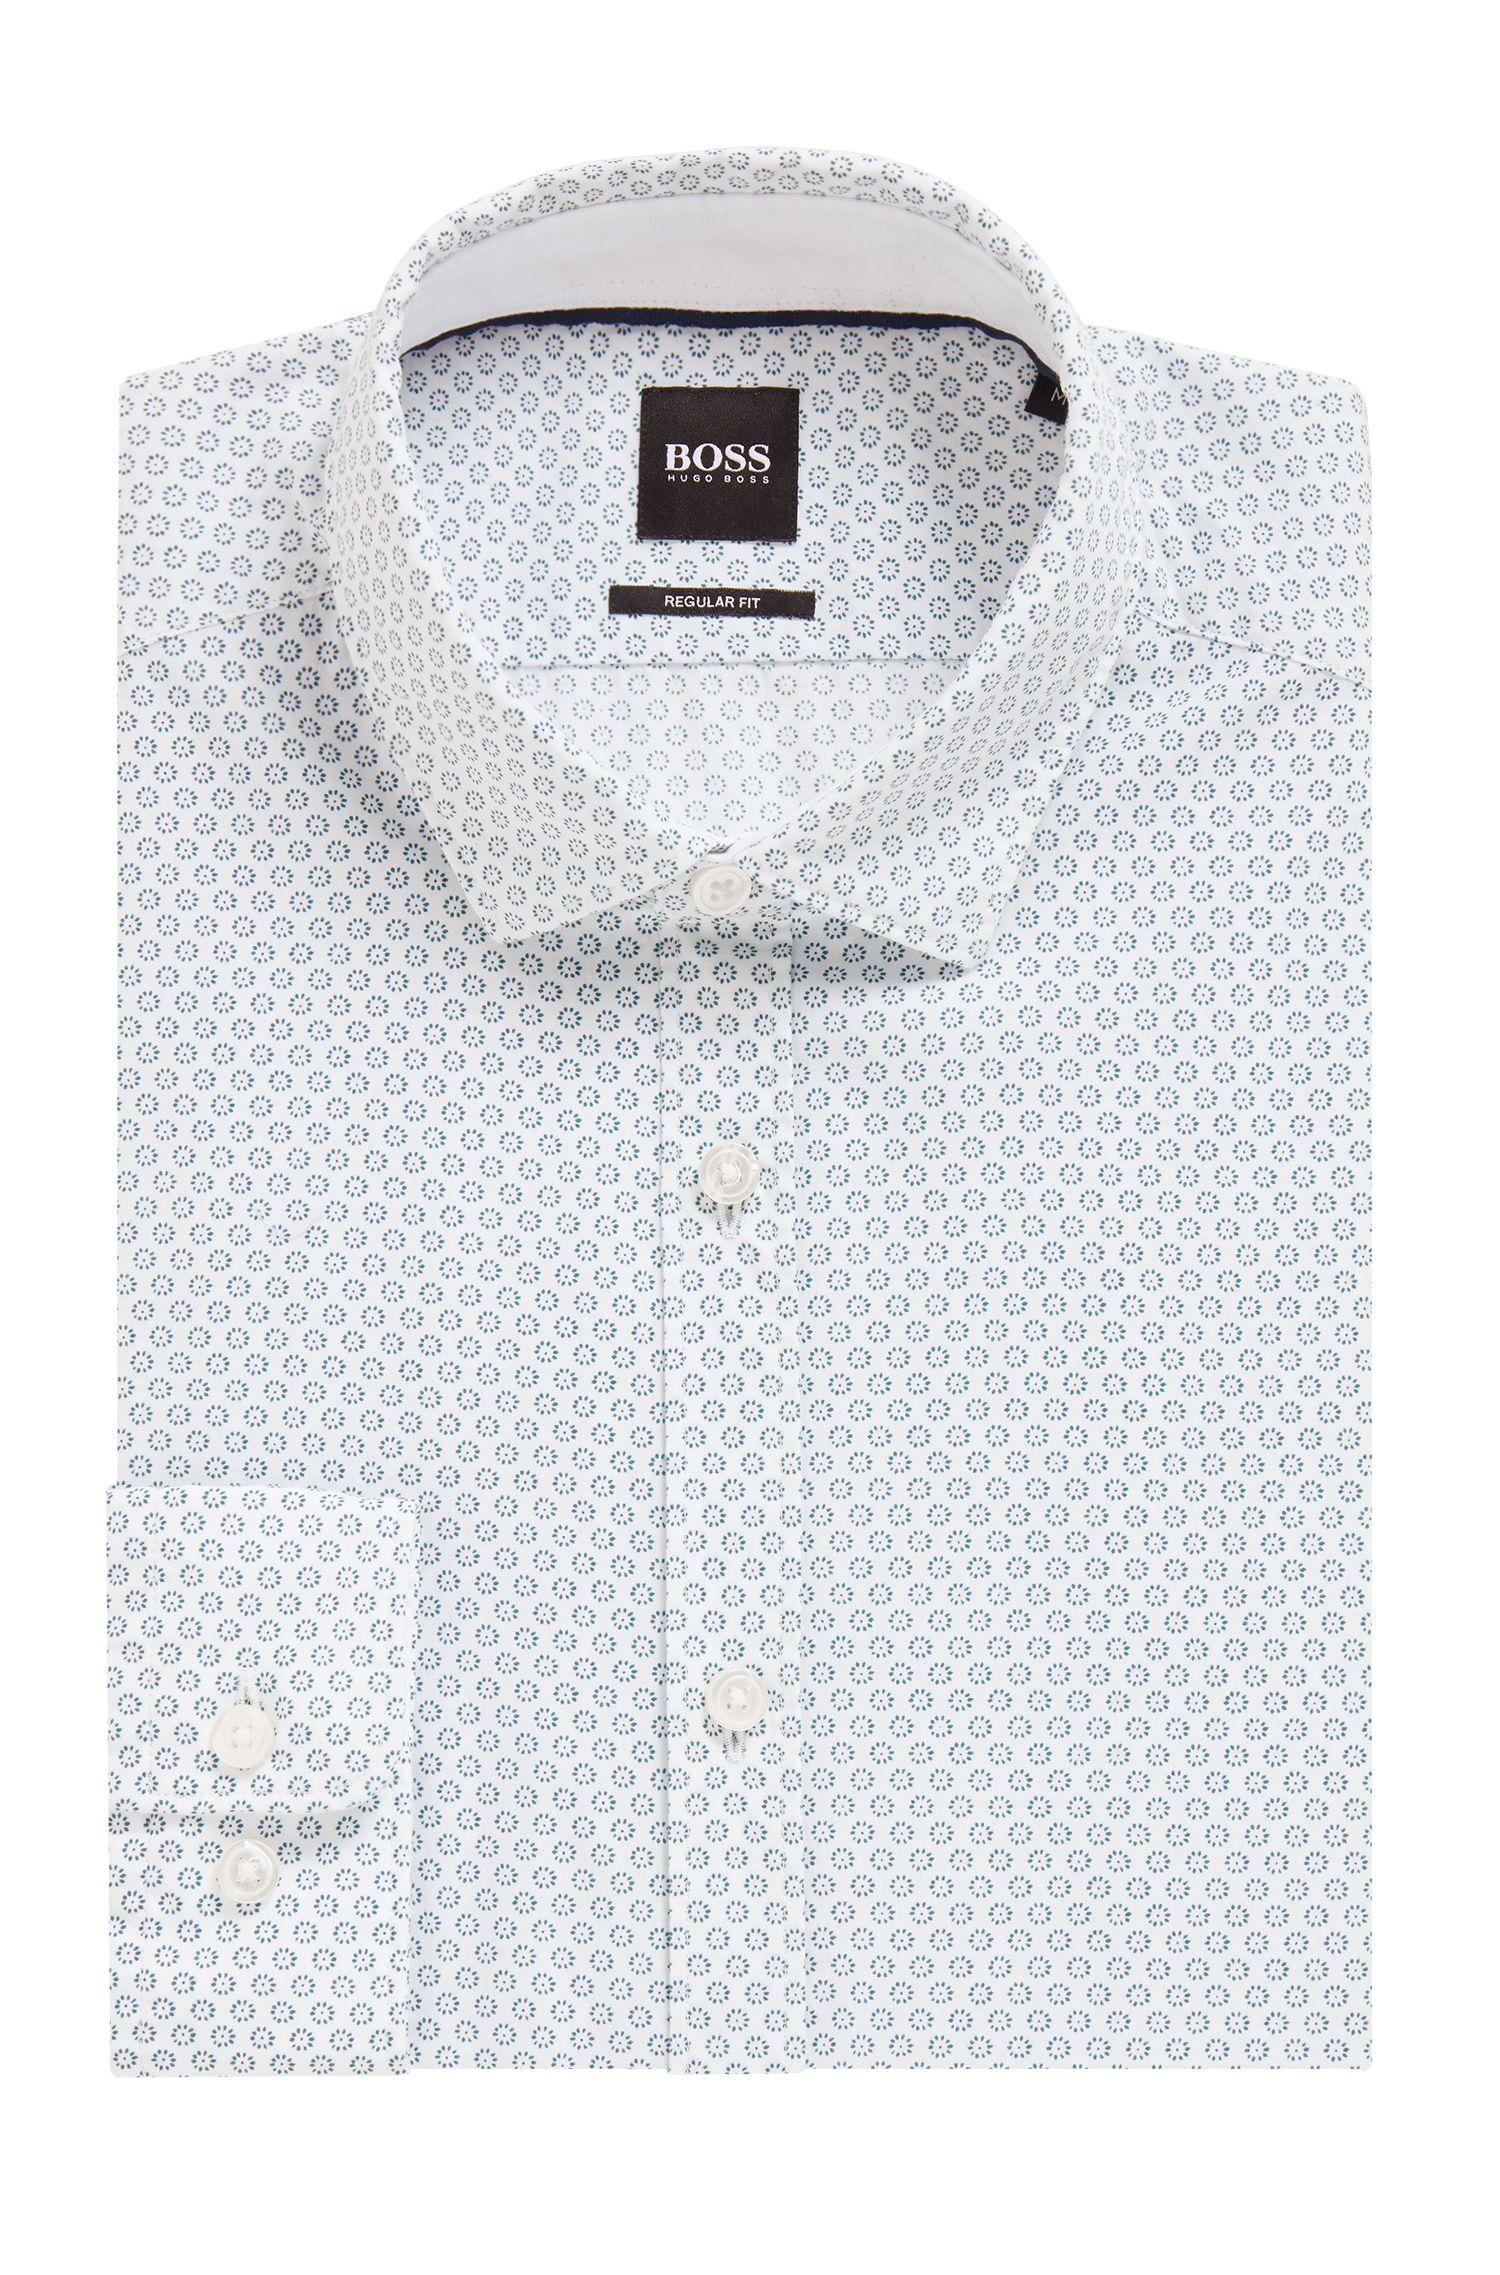 Regular-Fit Hemd aus bedruckter Baumwolle, Türkis